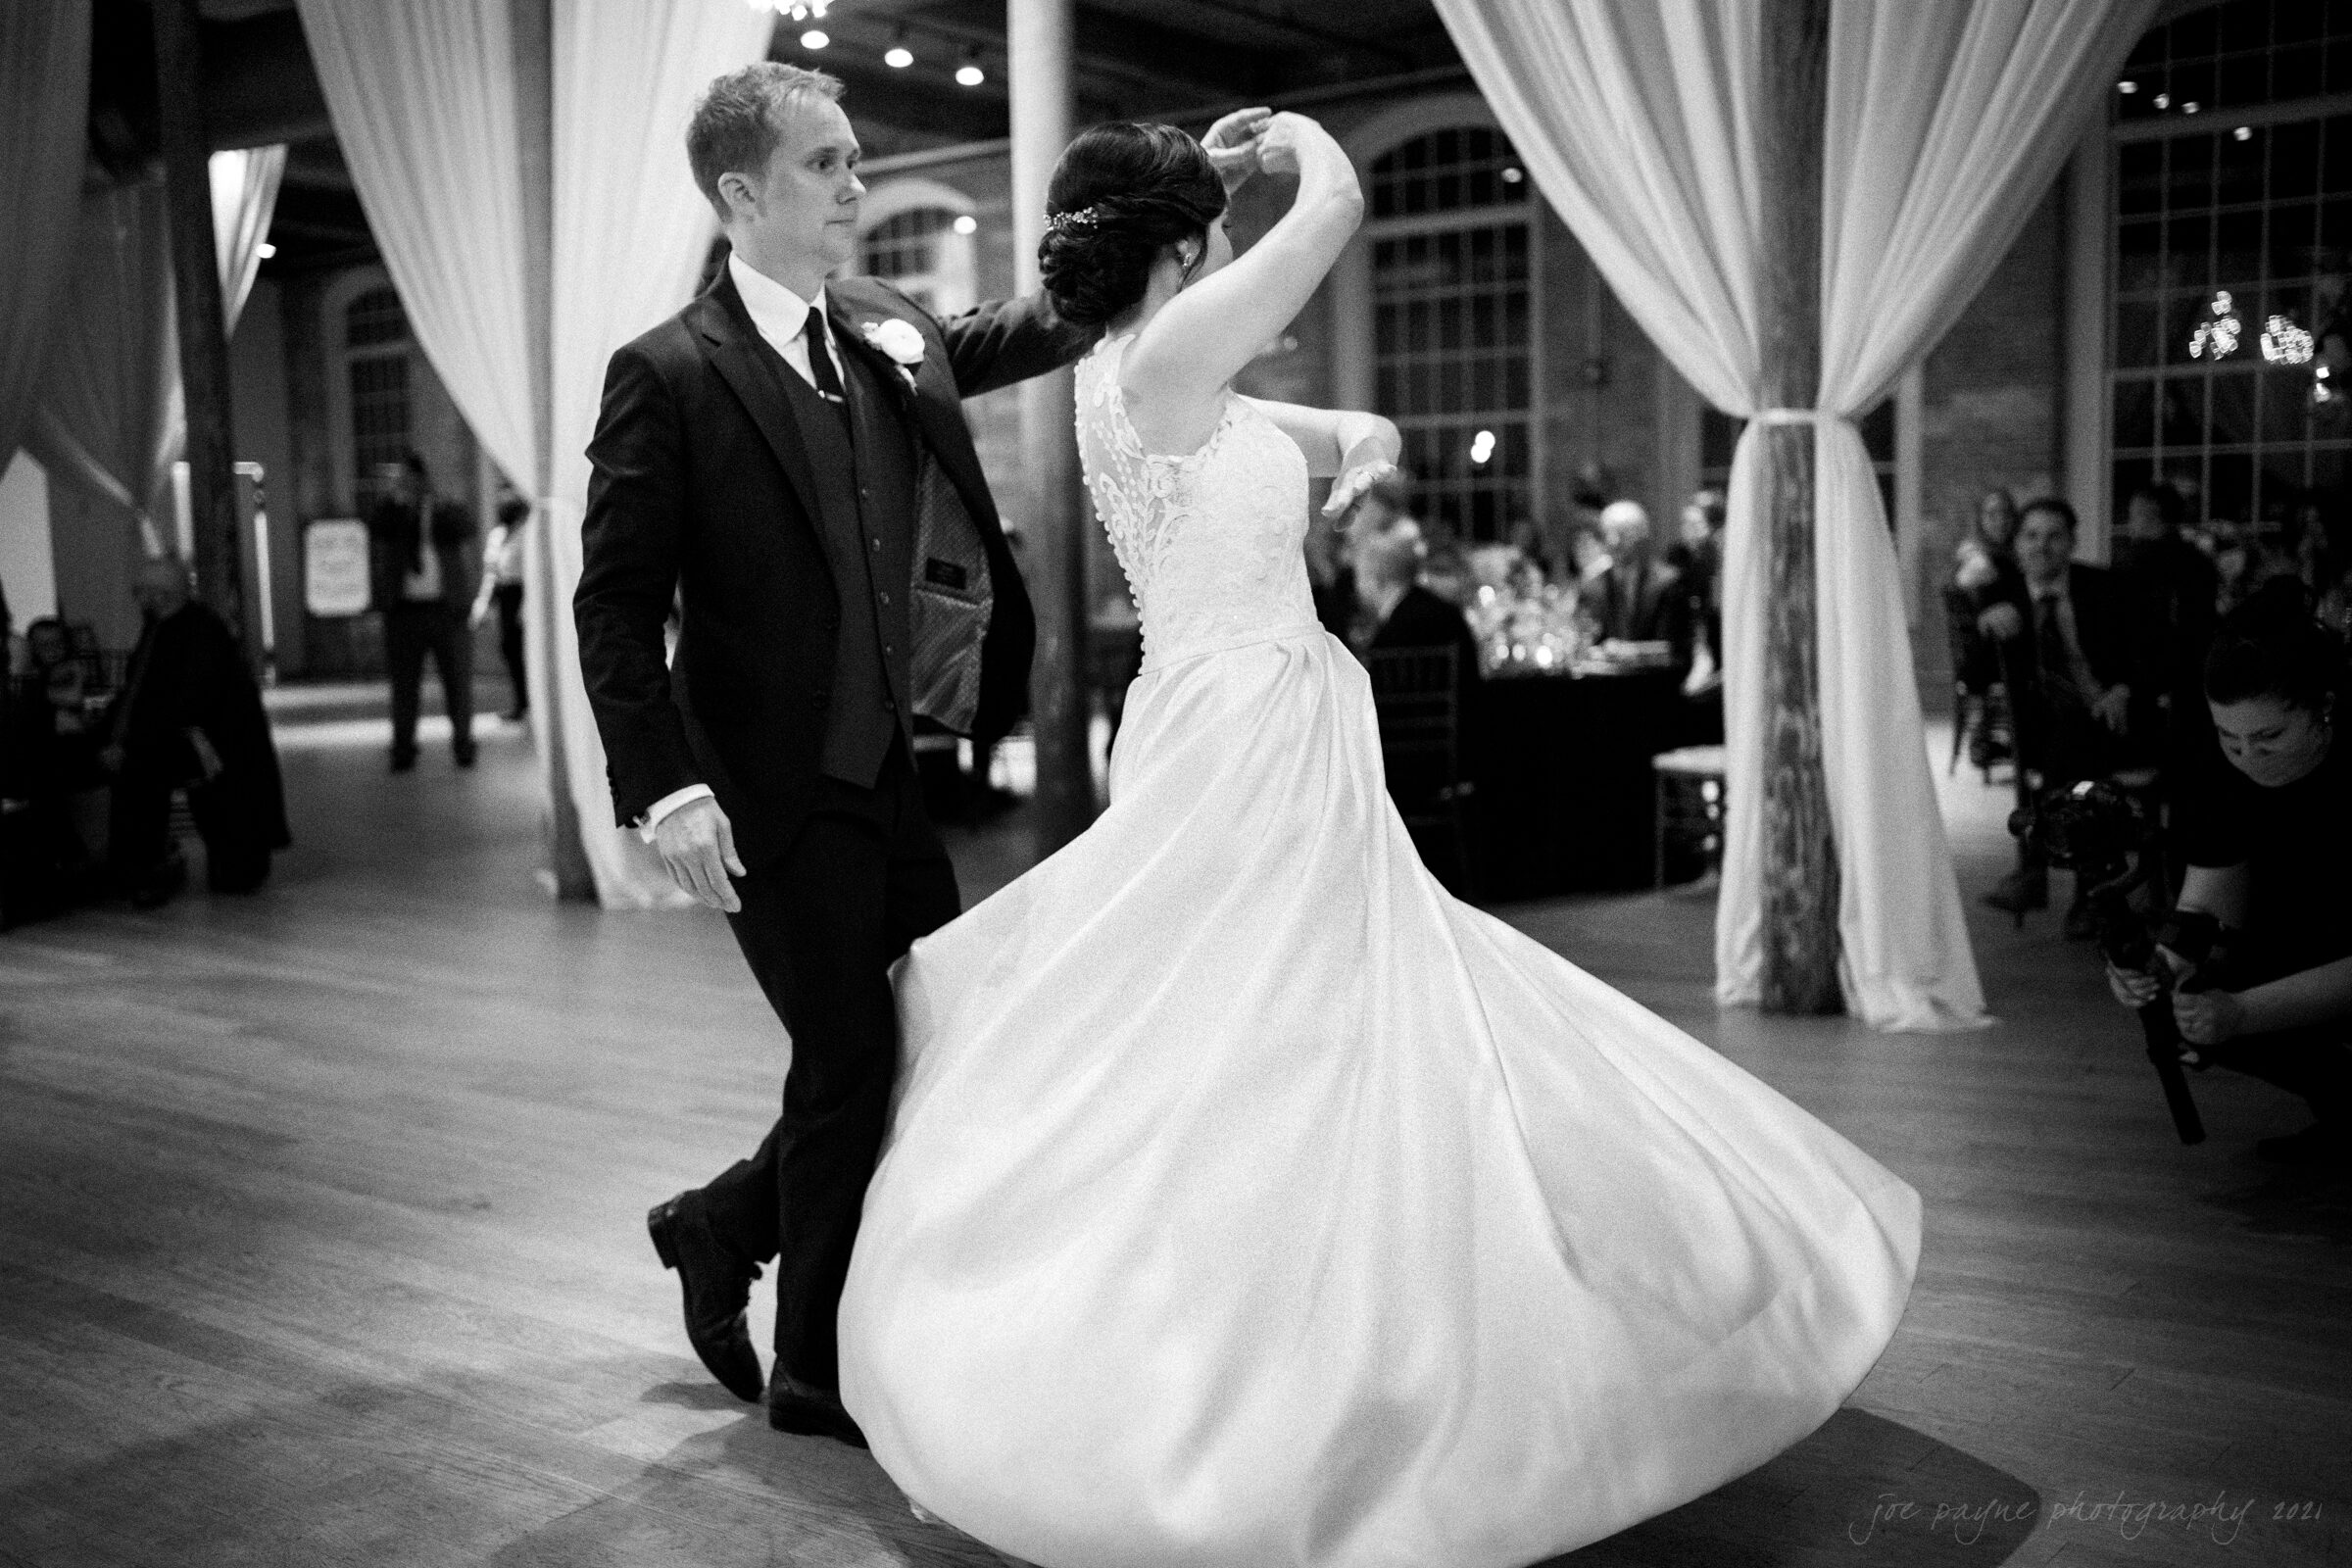 Cotton Room Wedding Photographer Kate Martin 36